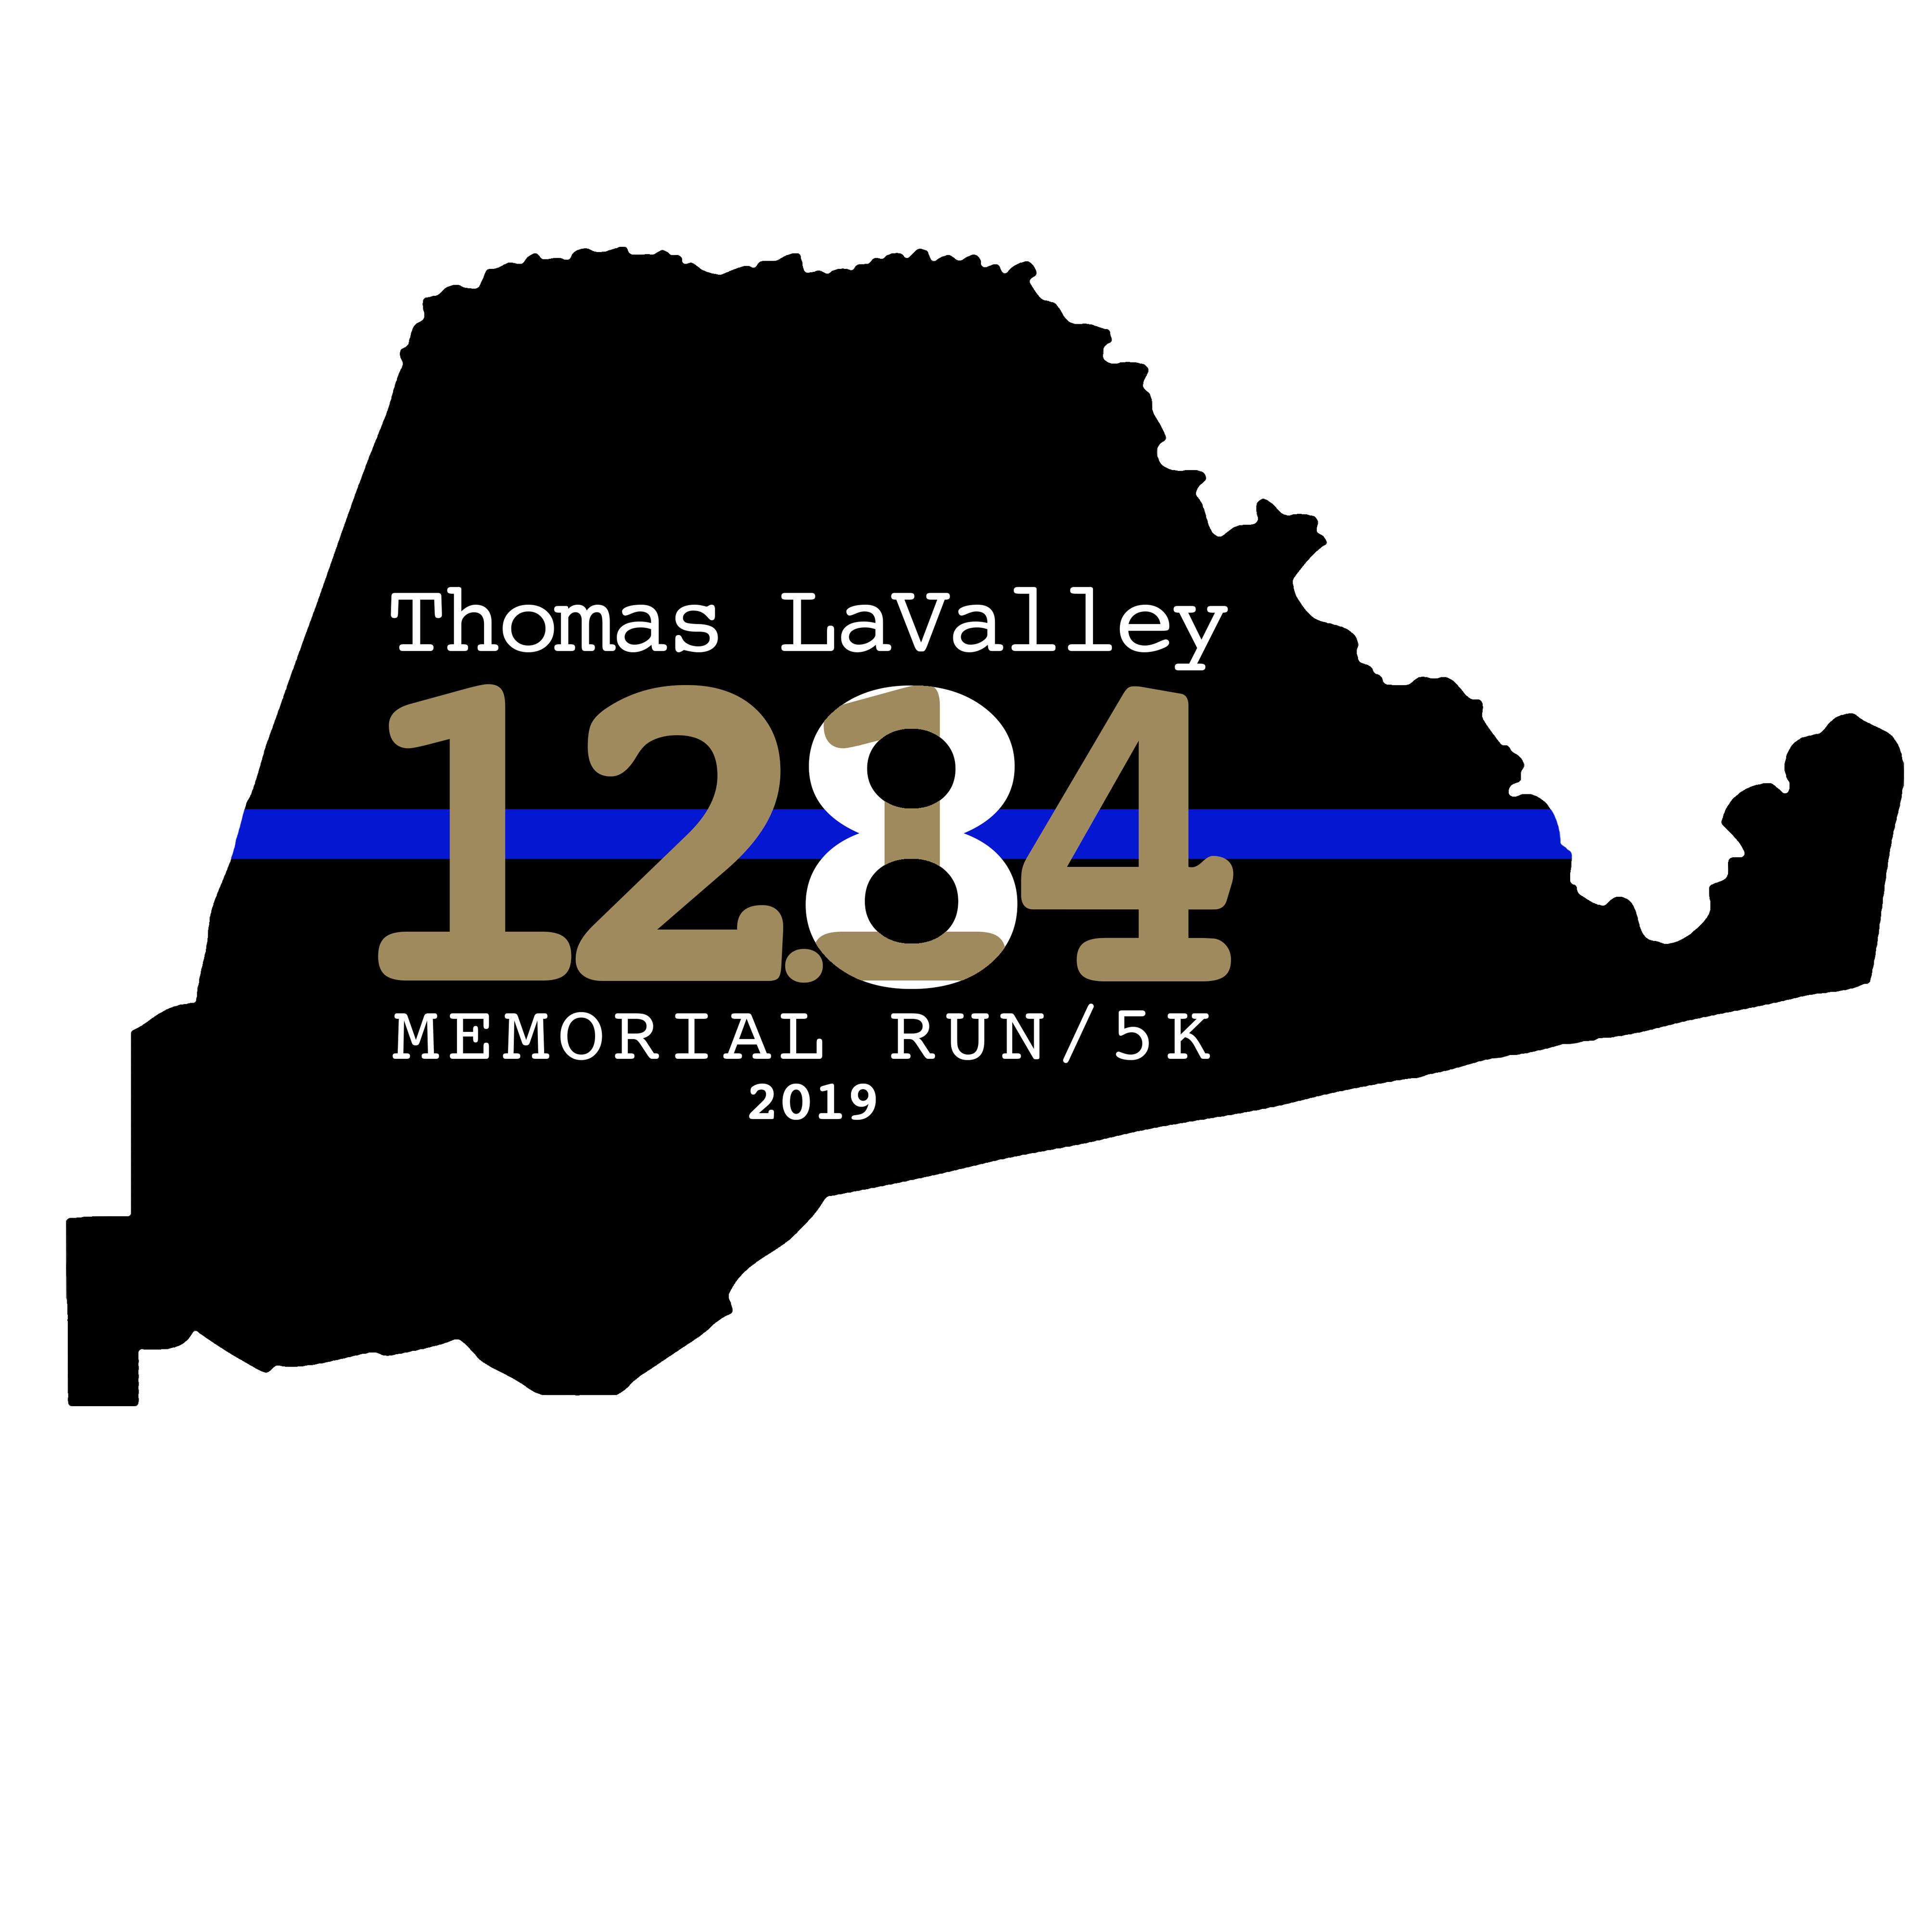 Thomas LaValley 12.84